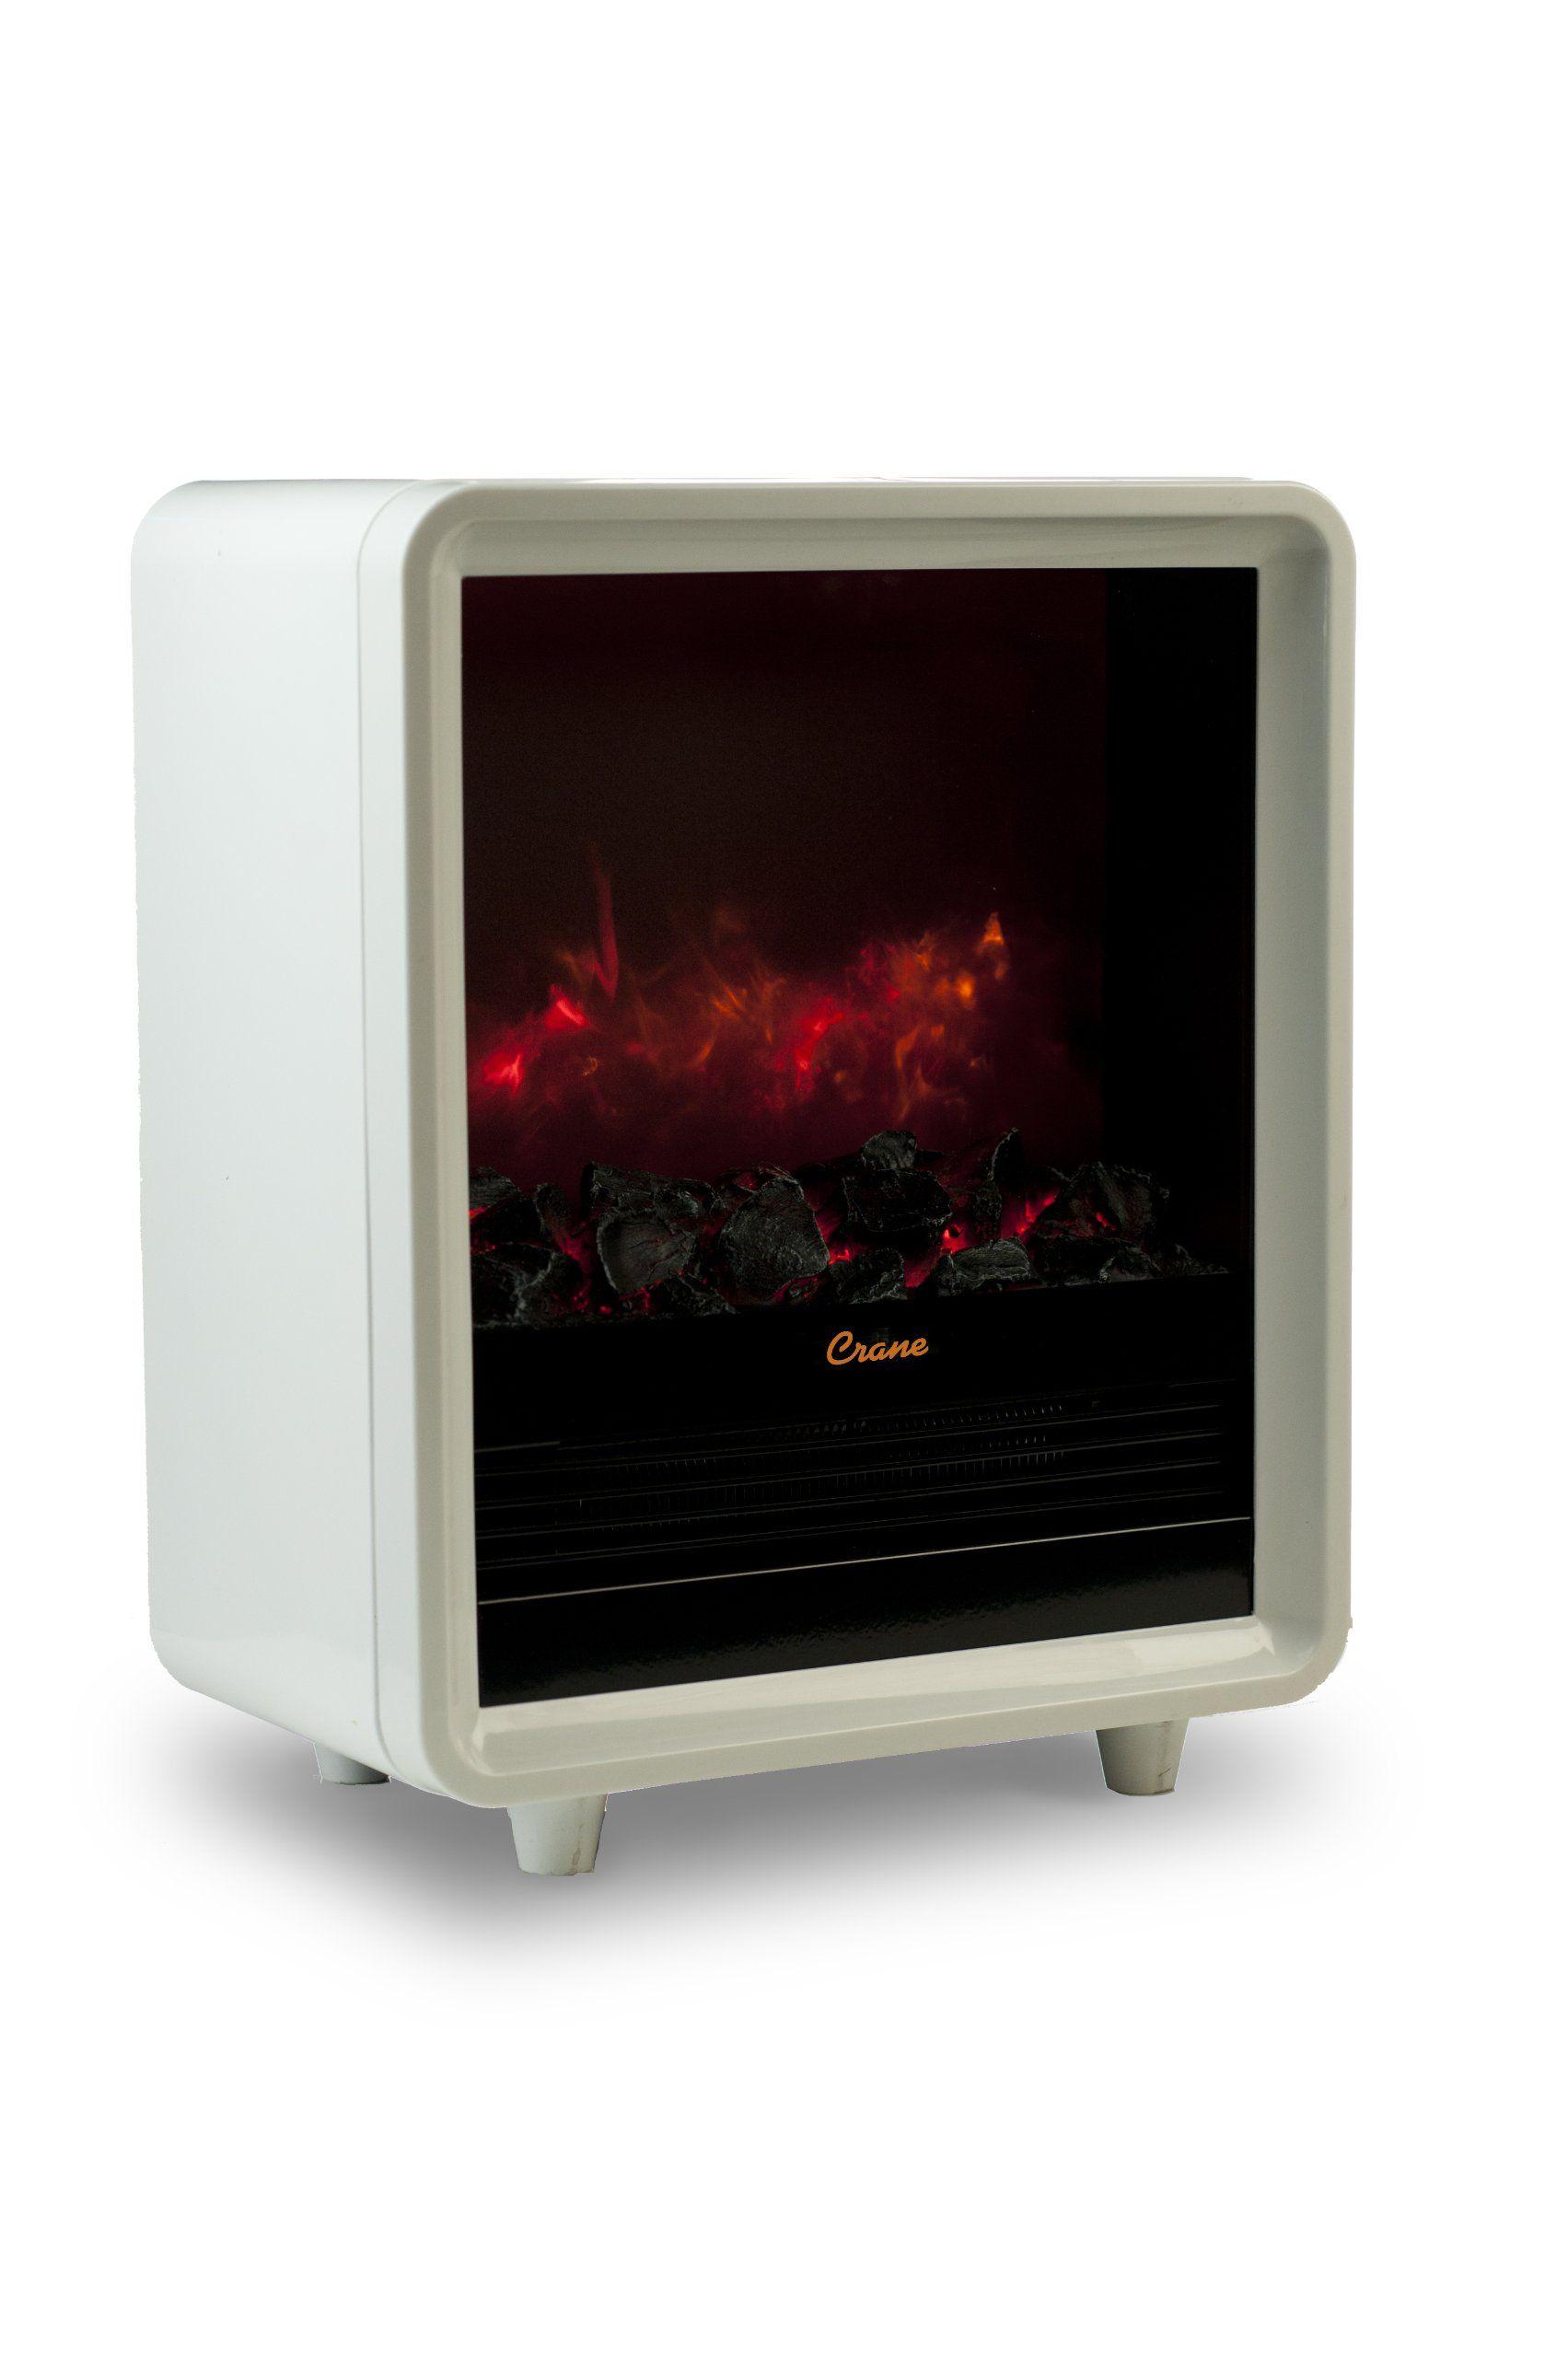 Crane Mini Fireplace Heater White Fireplace Heater Small